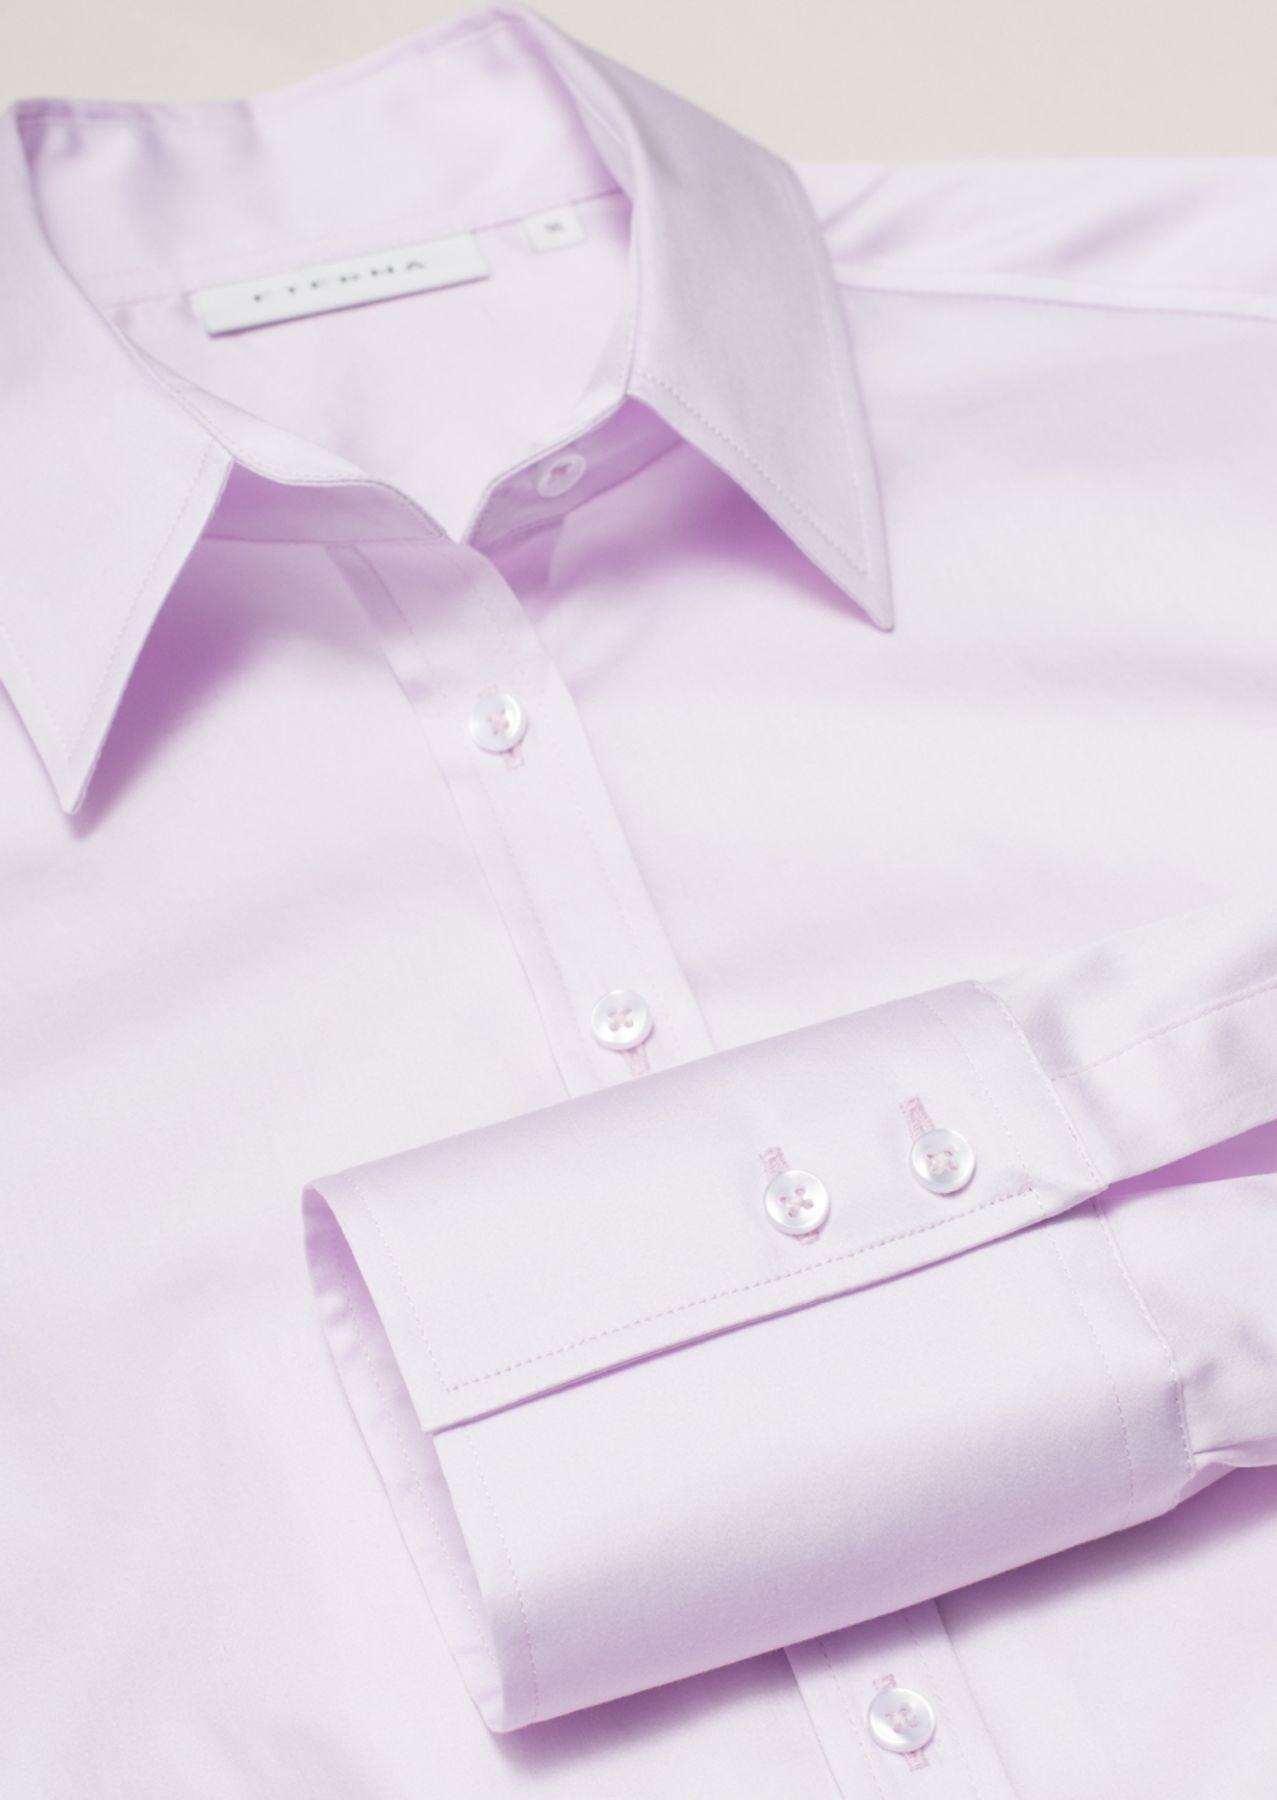 Eterna - Comfort Fit - Damen Langarm Bluse in Rosa (5352 D624) – Bild 4